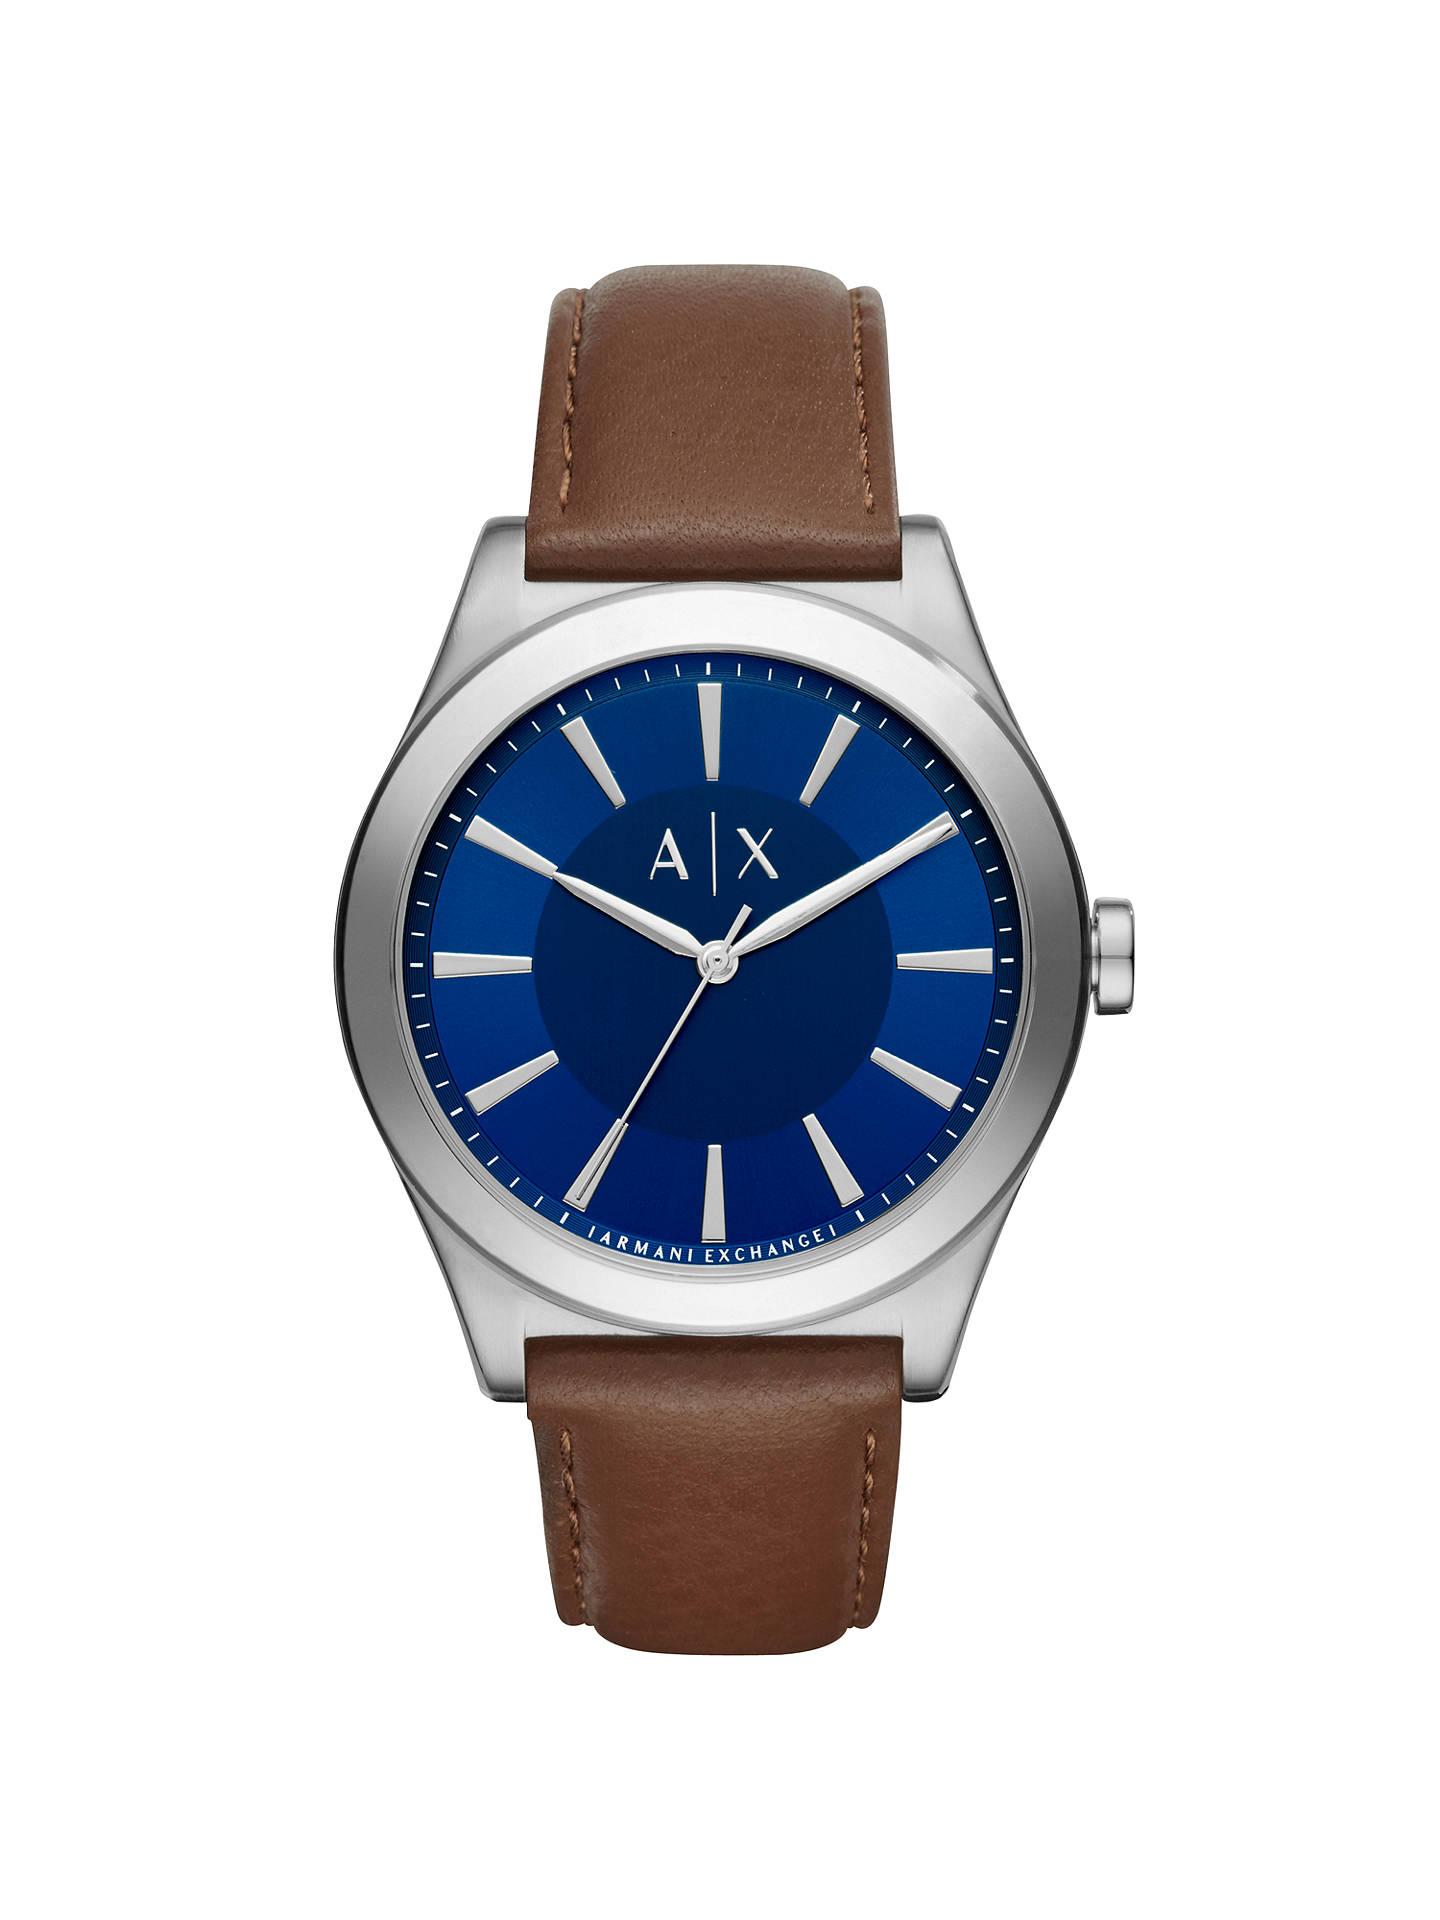 Armani Exchange AX2324 Men's Leather Strap Watch, Dark Brown/Blue £57.50 @ John Lewis & Partners